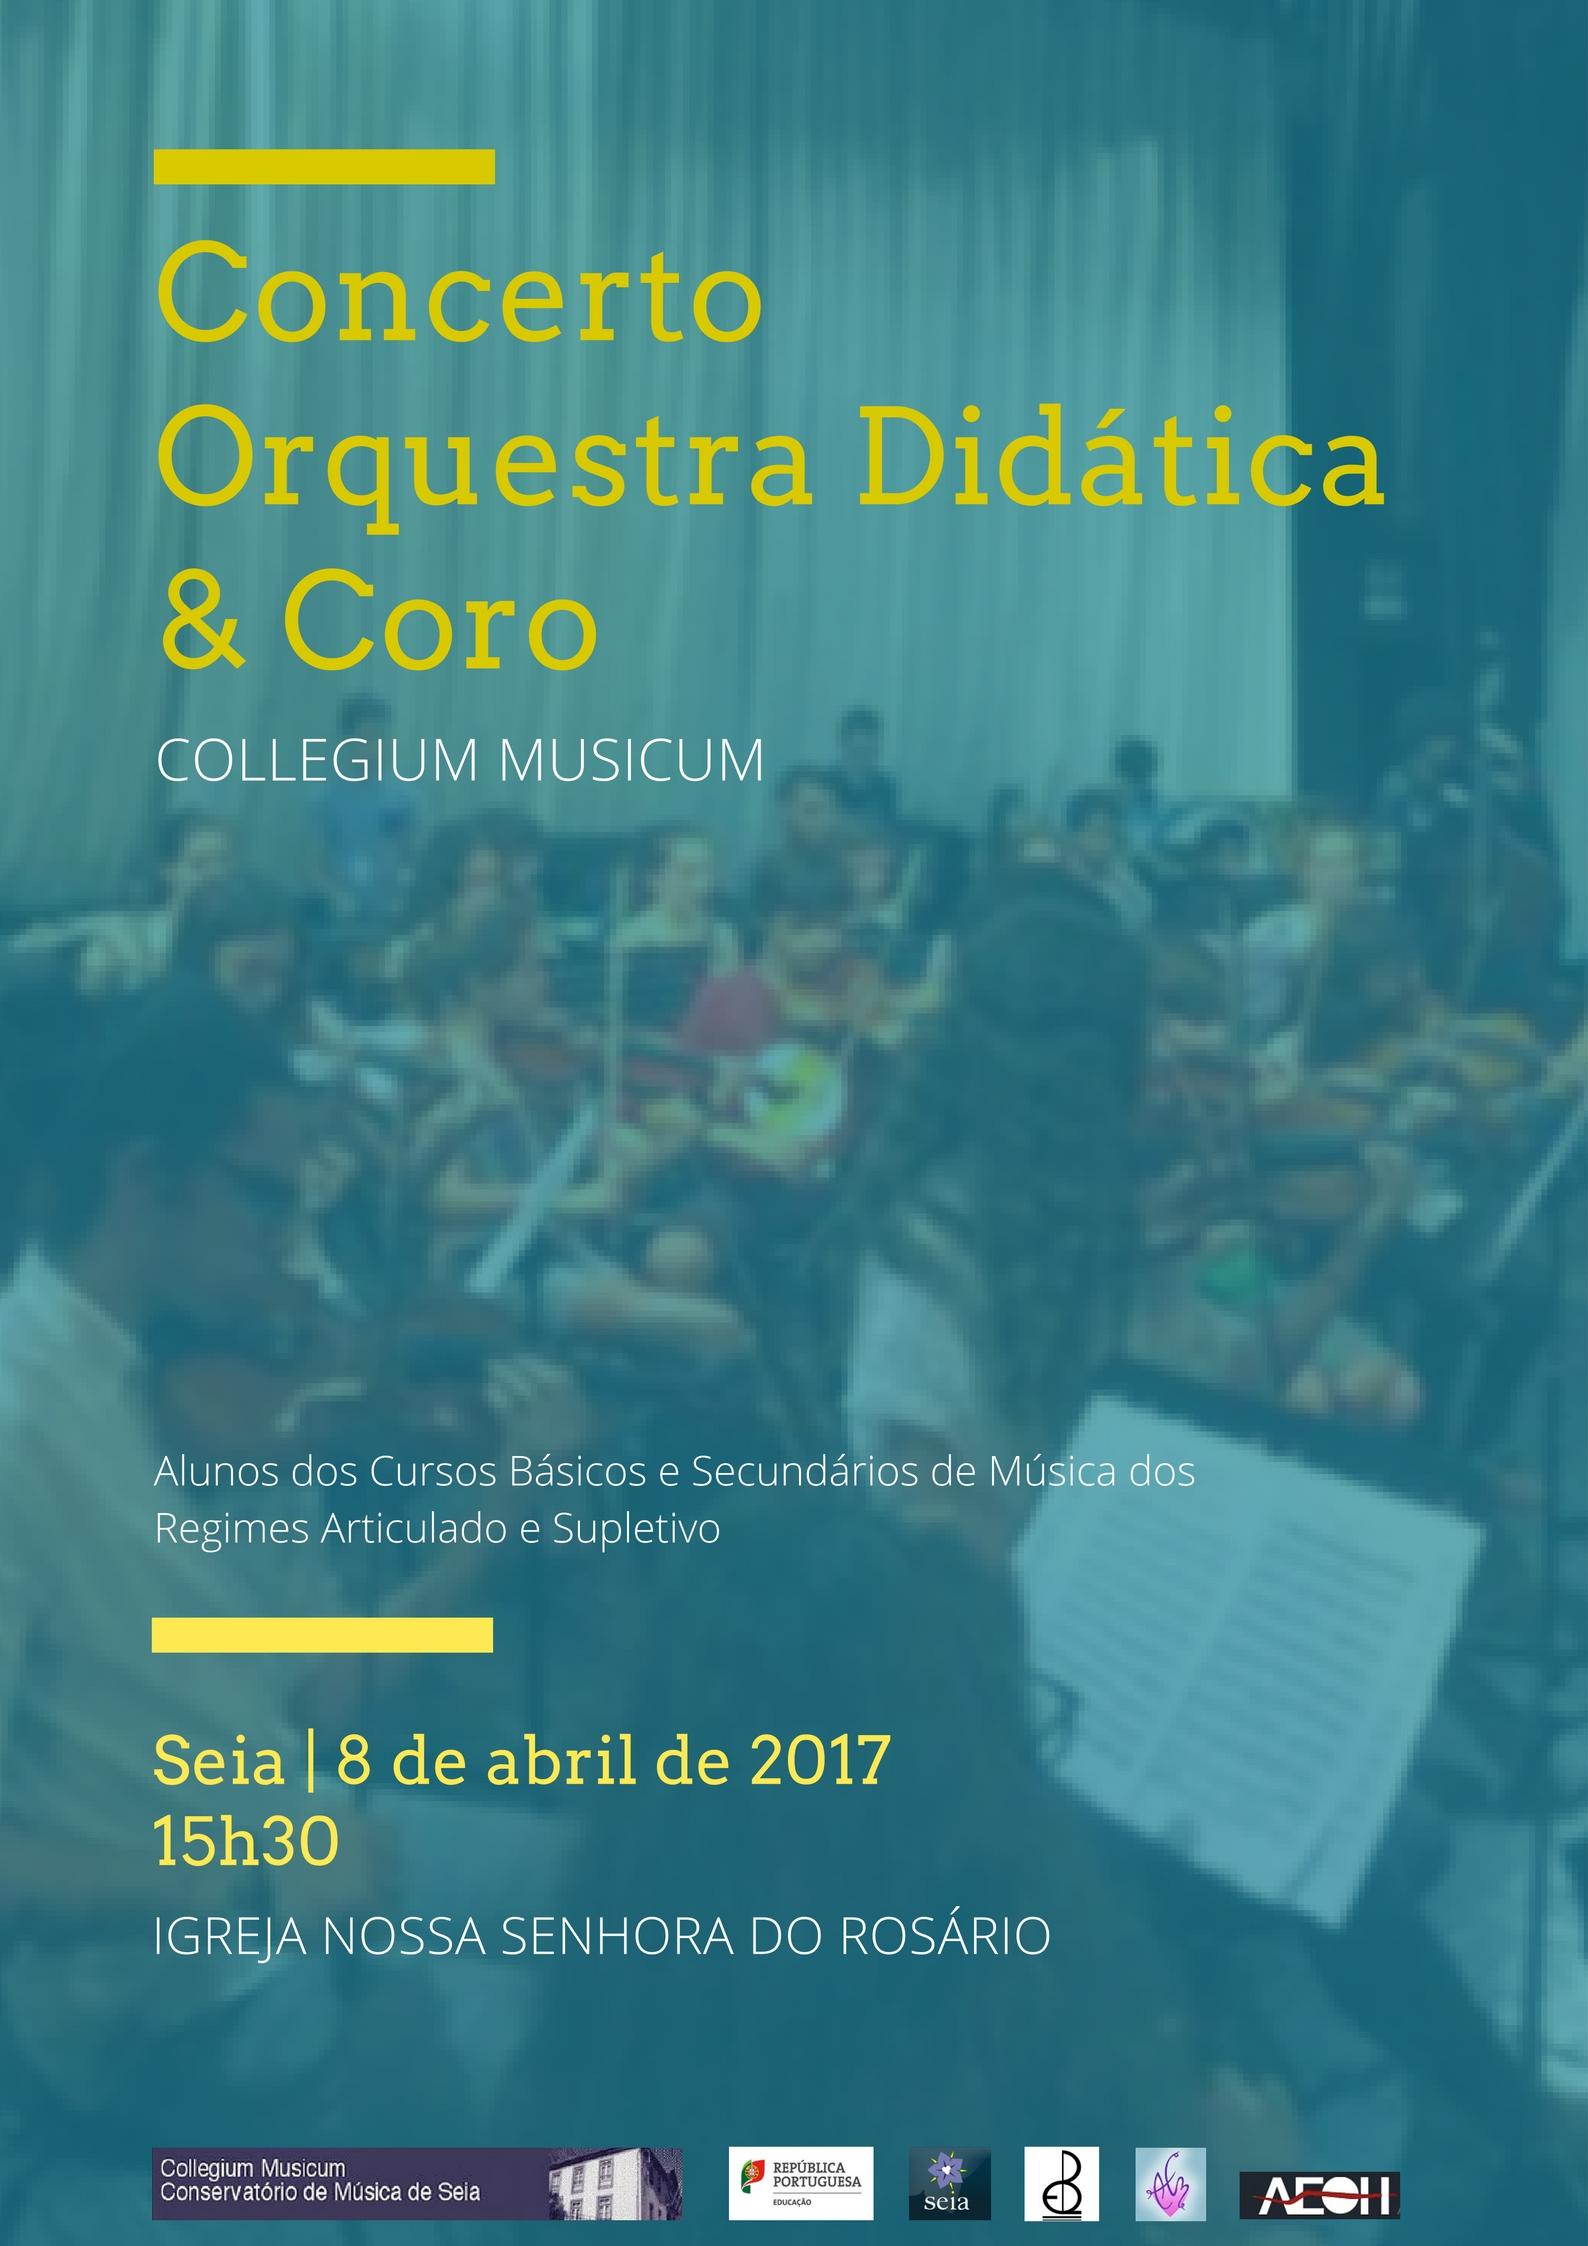 Concerto Orquestra Didática & Coro